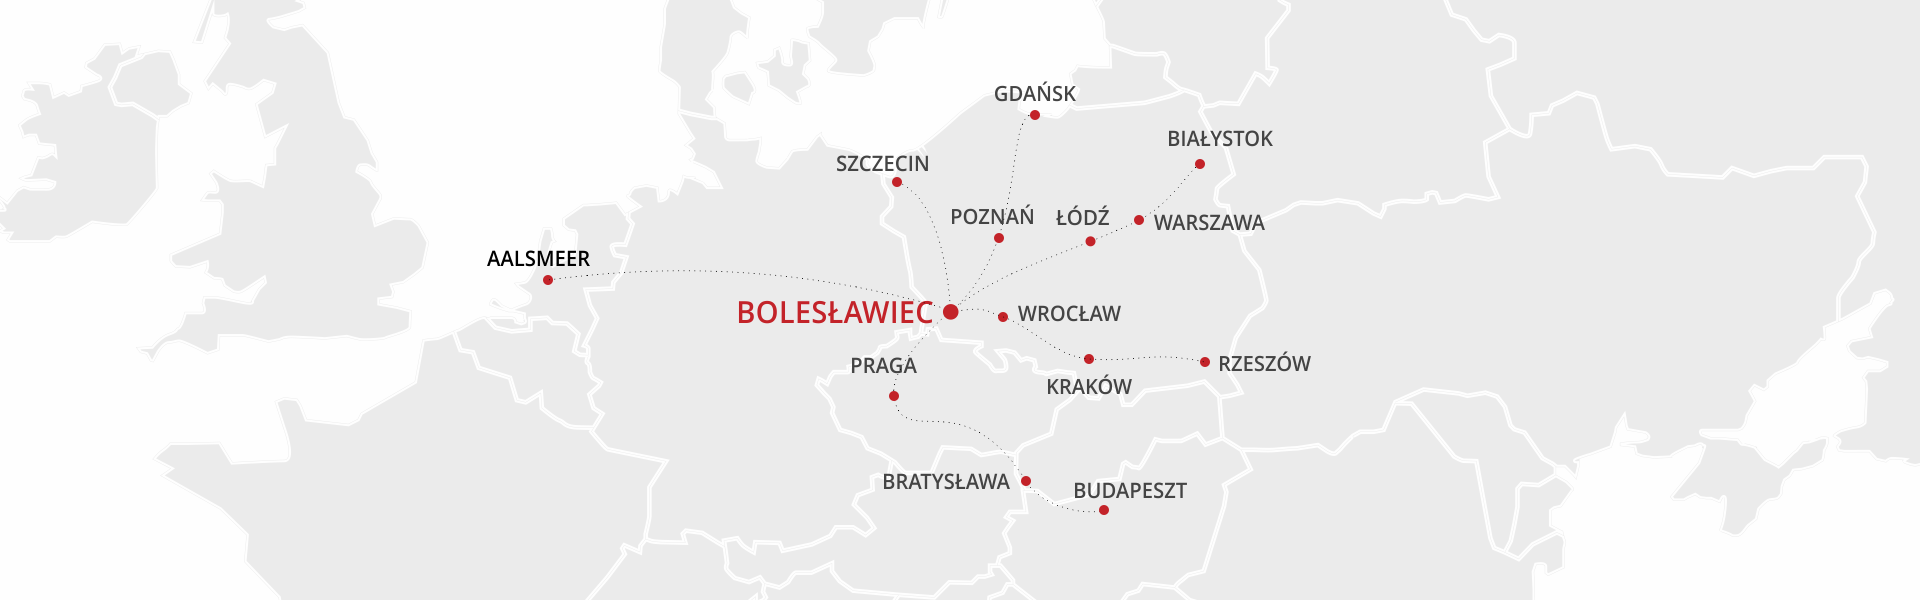 mapa-europy